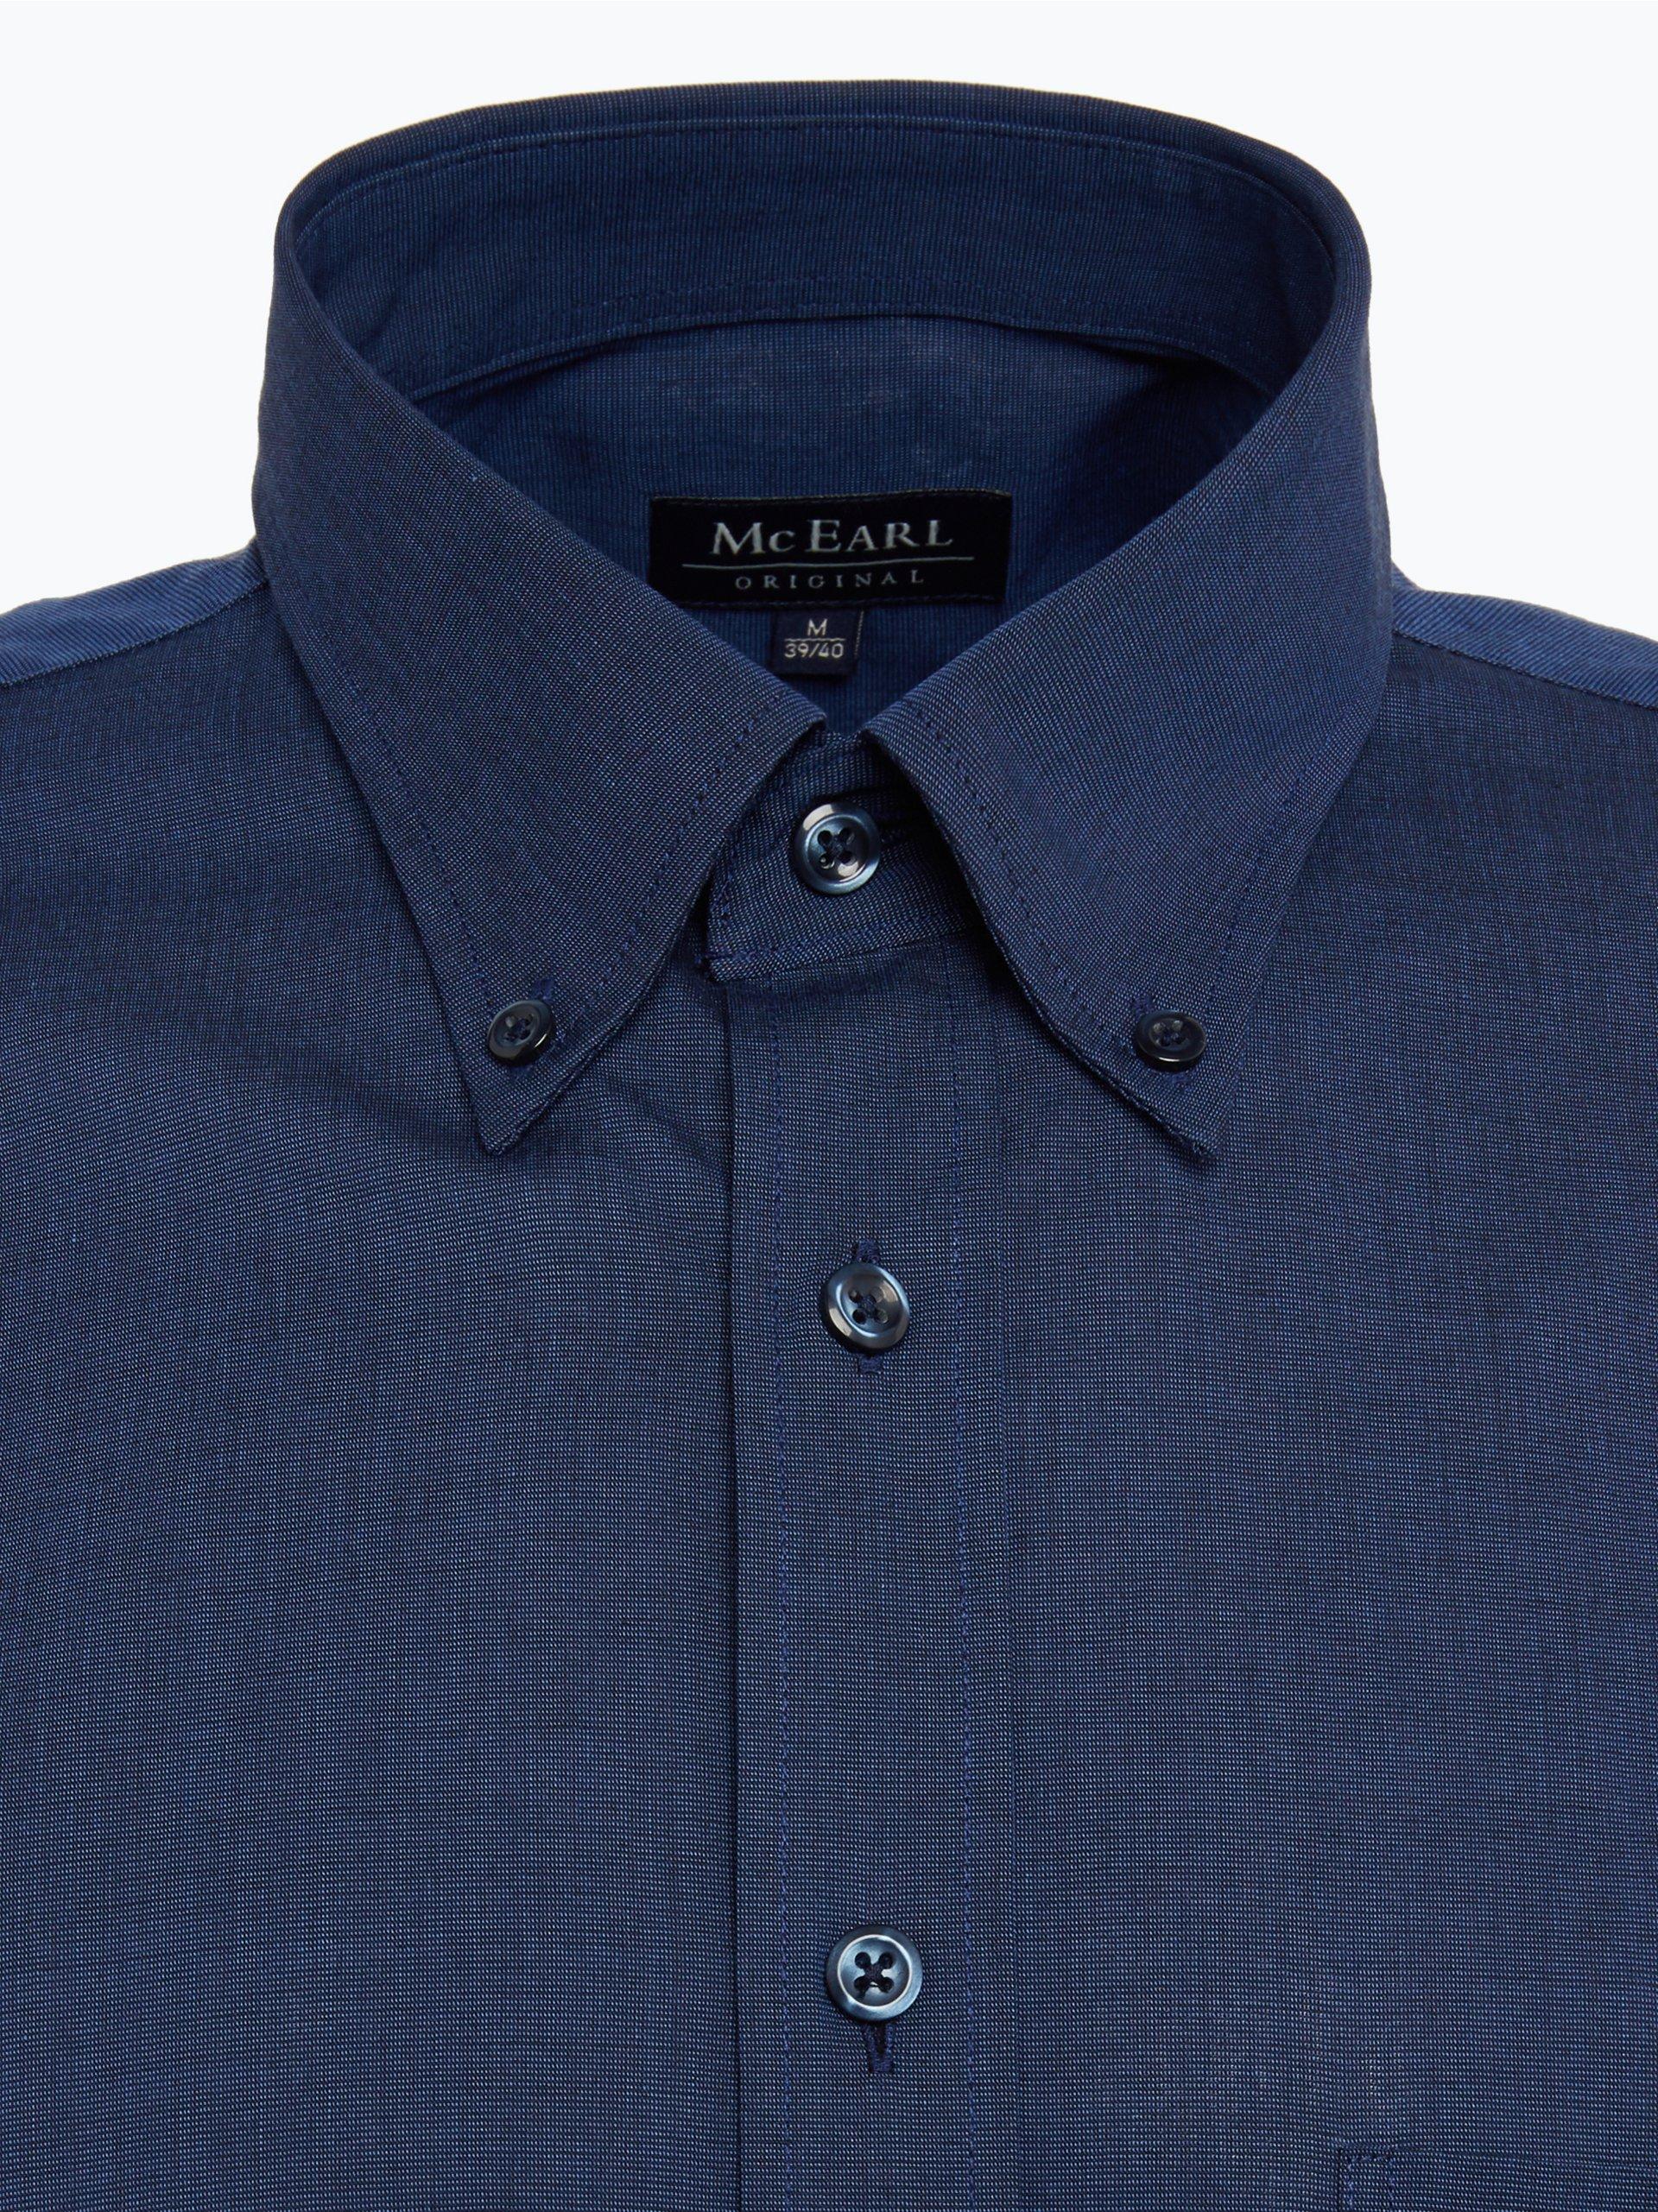 Mc Earl Herren Hemd